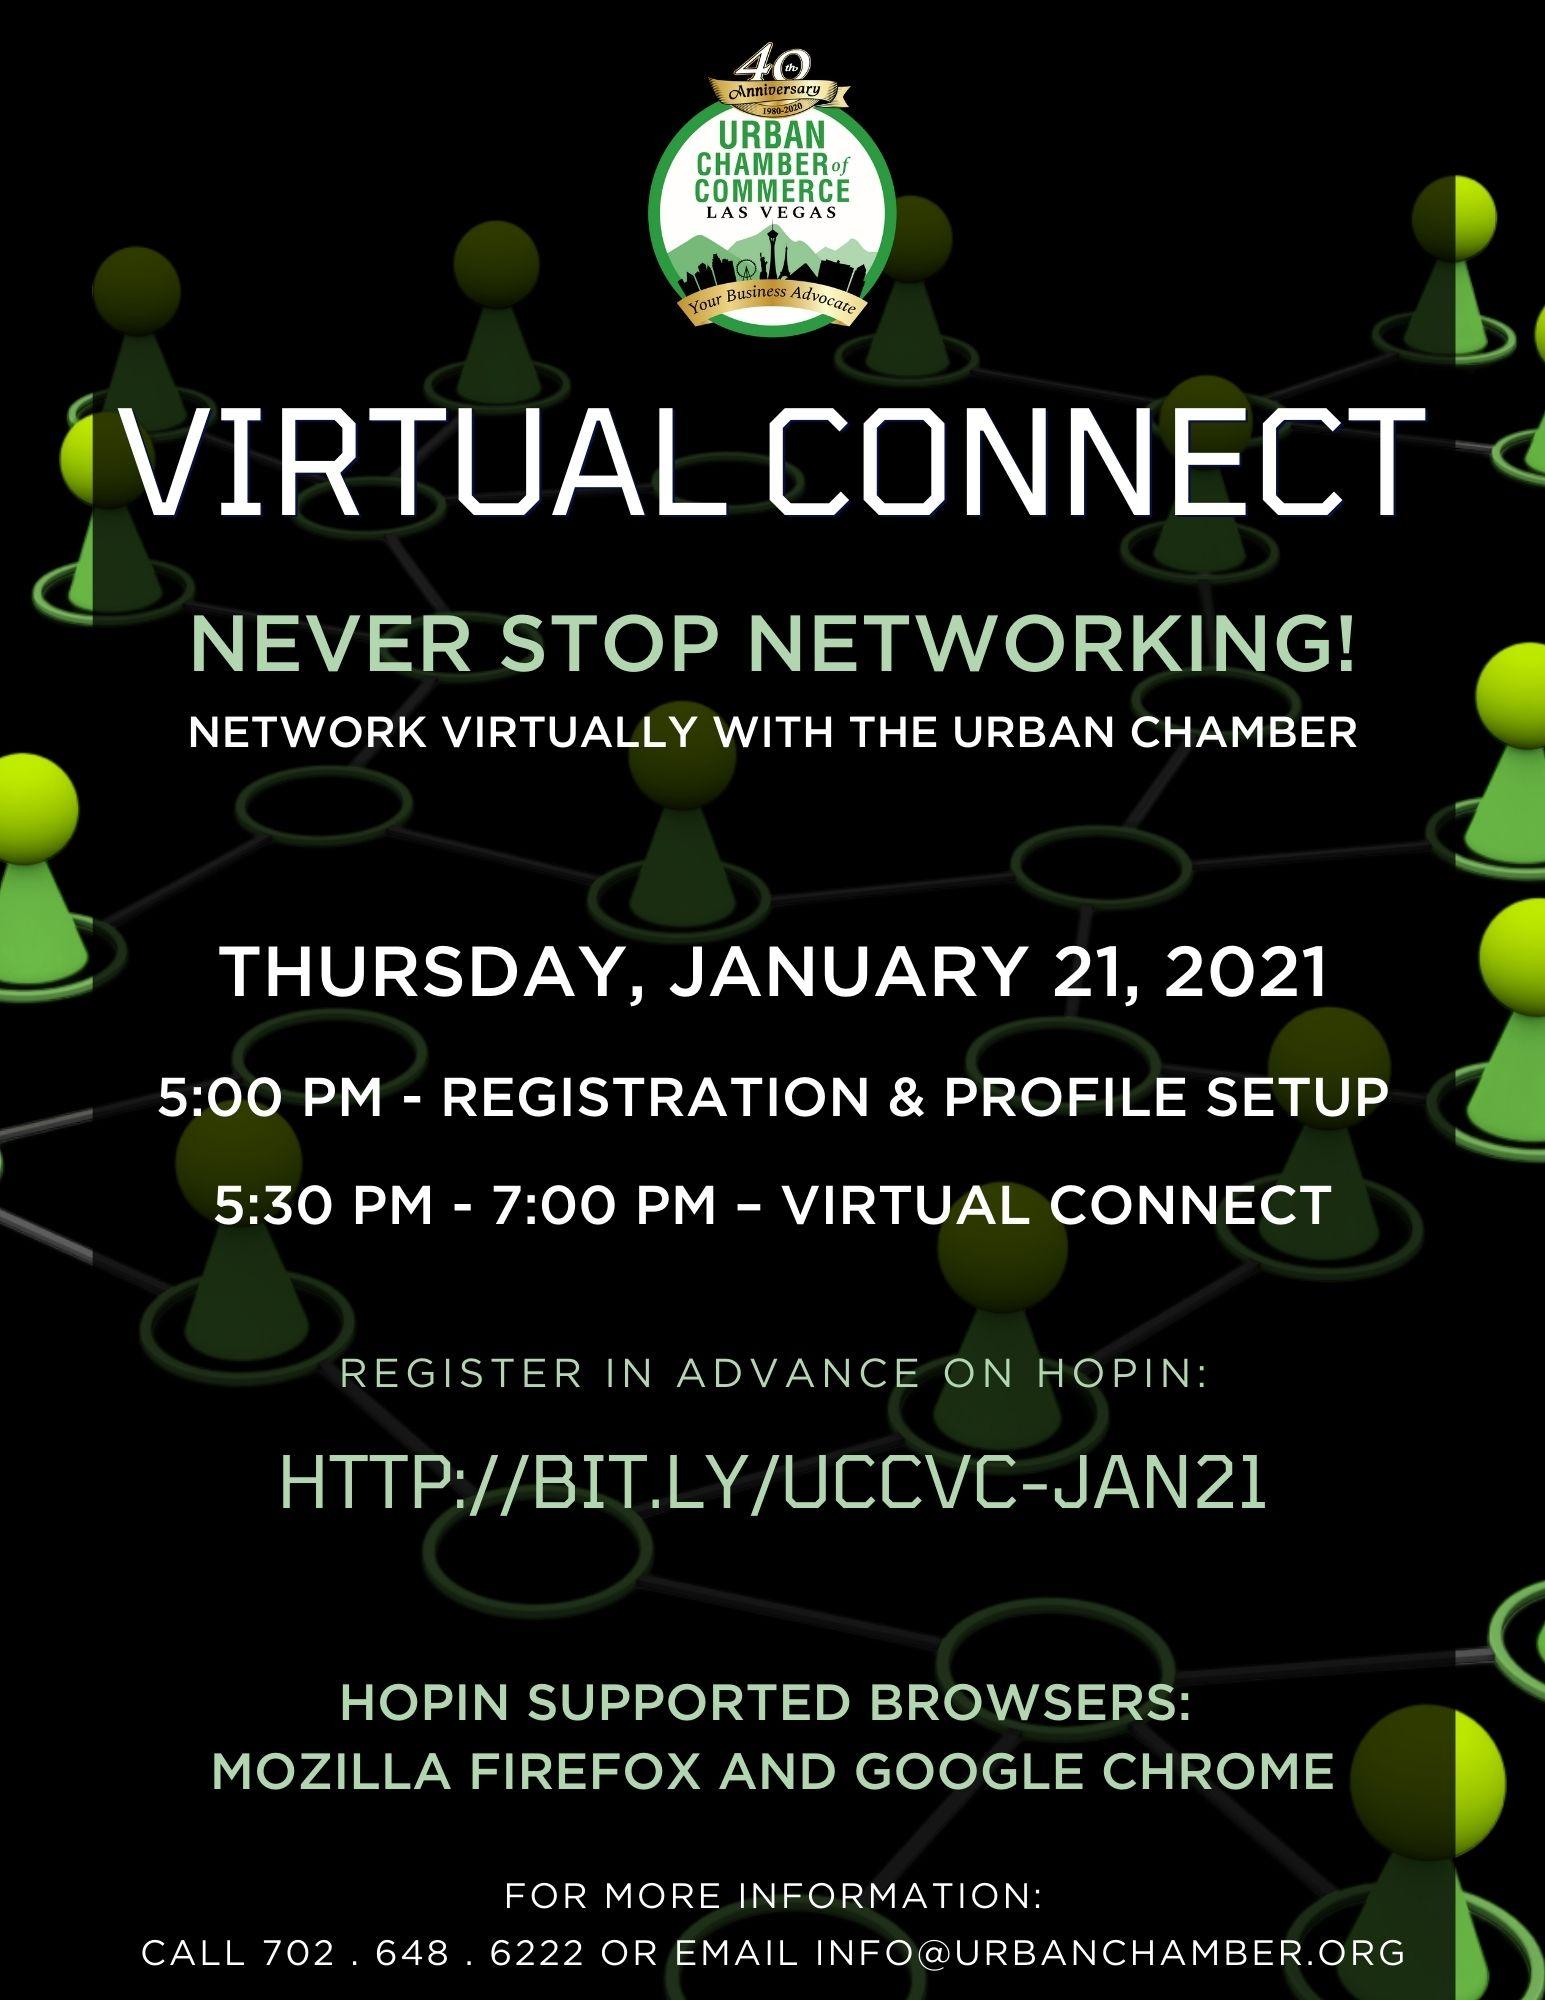 2021 Virtual Connect Flyer